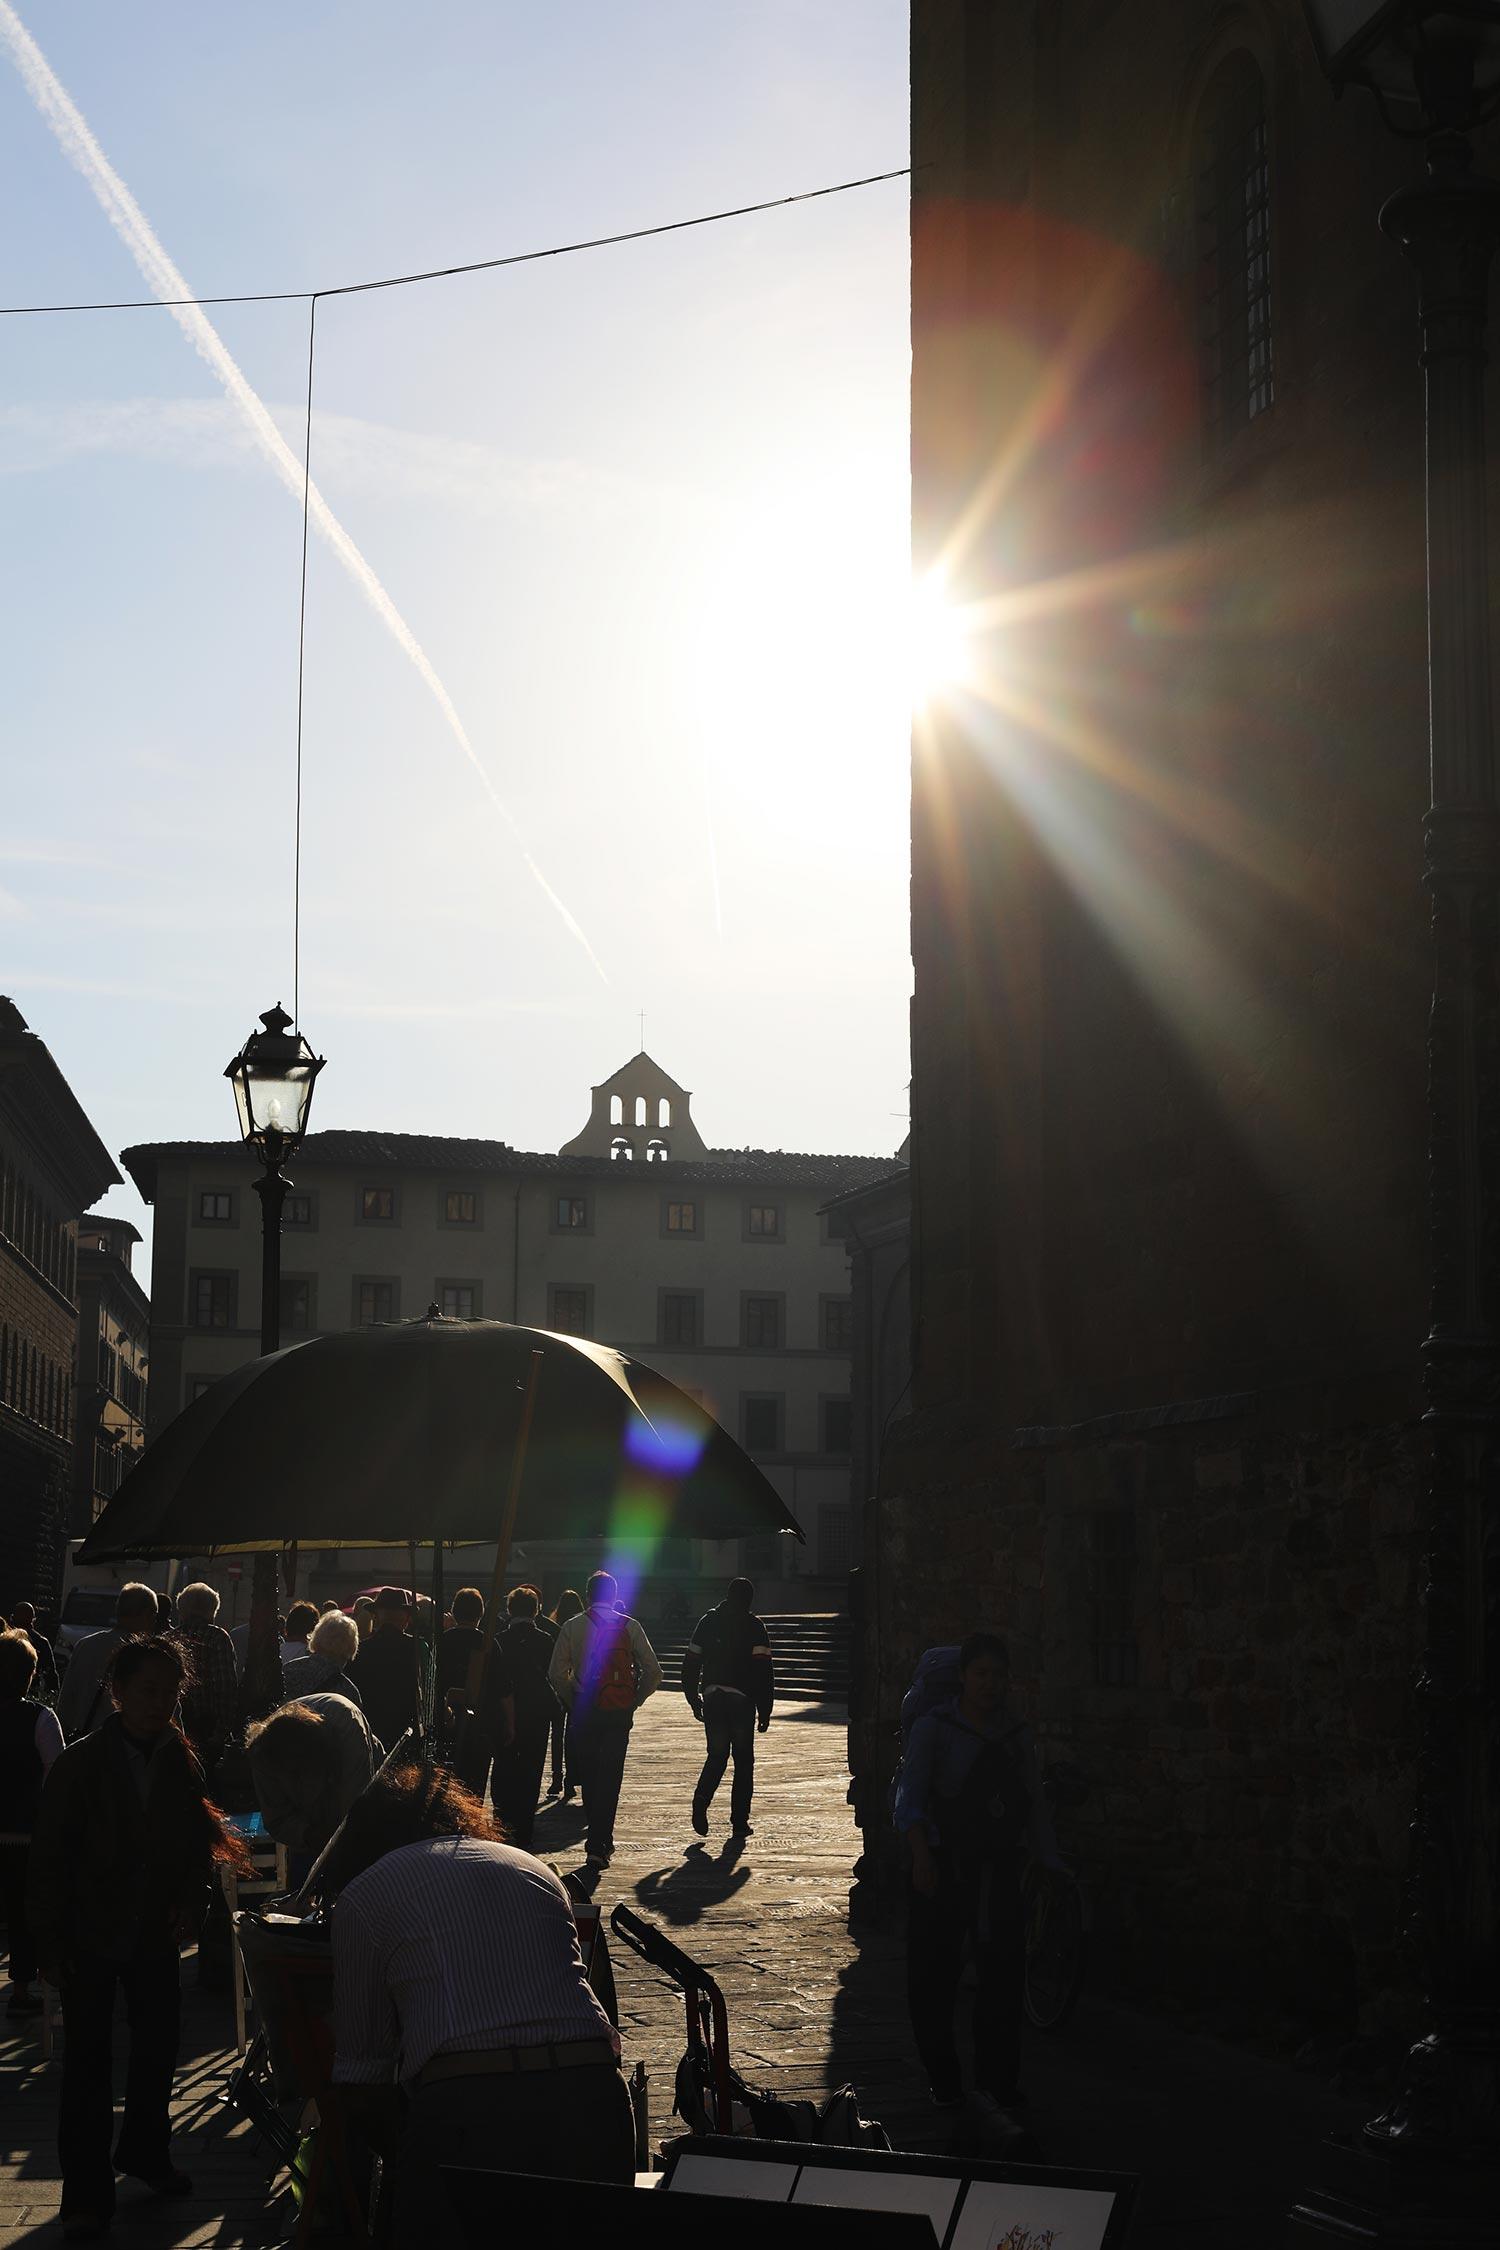 Pilgrimage_Rome_4281_Florence.jpg